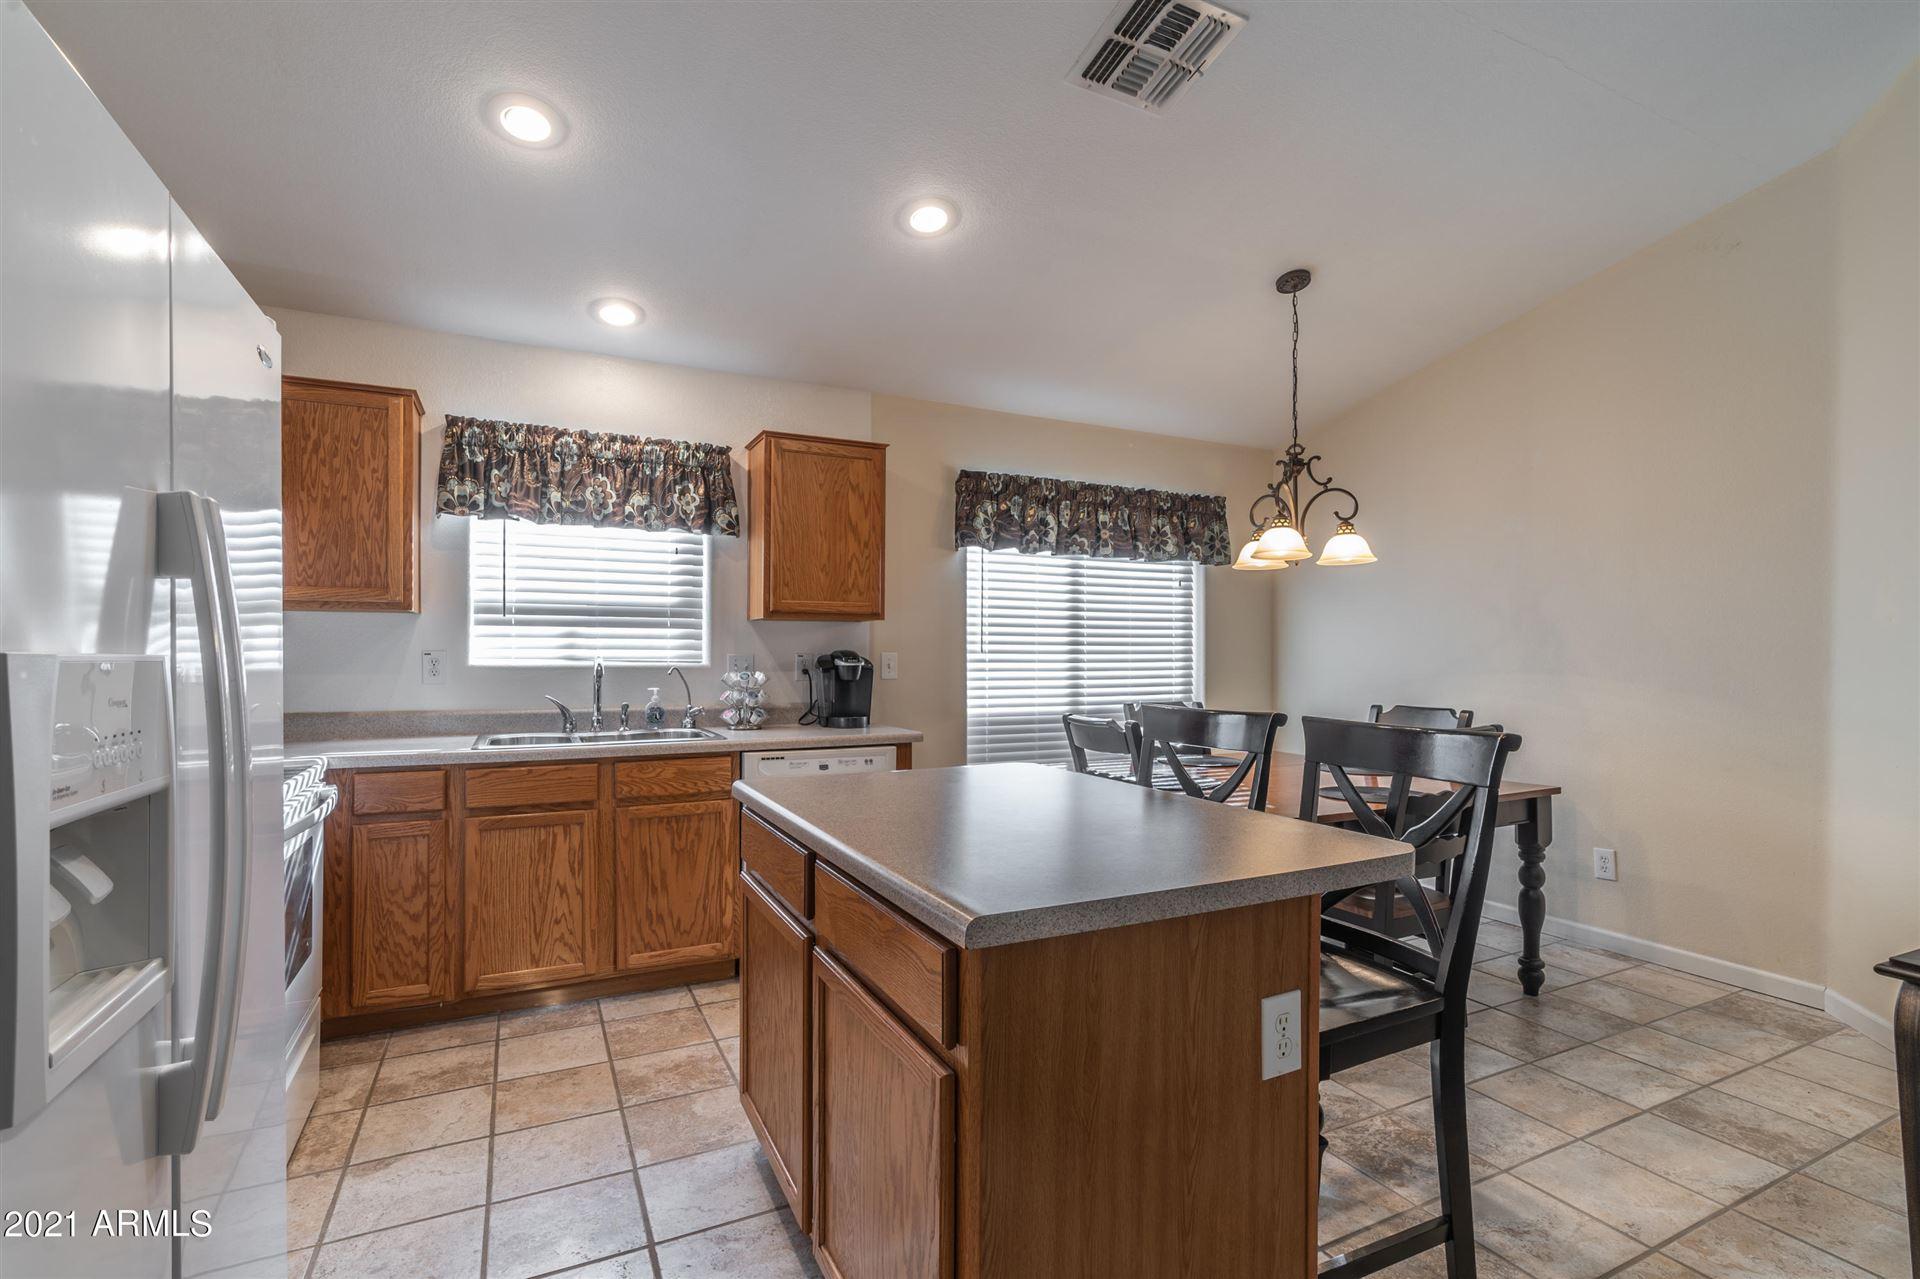 Photo of 42503 W HILLMAN Drive, Maricopa, AZ 85138 (MLS # 6202060)